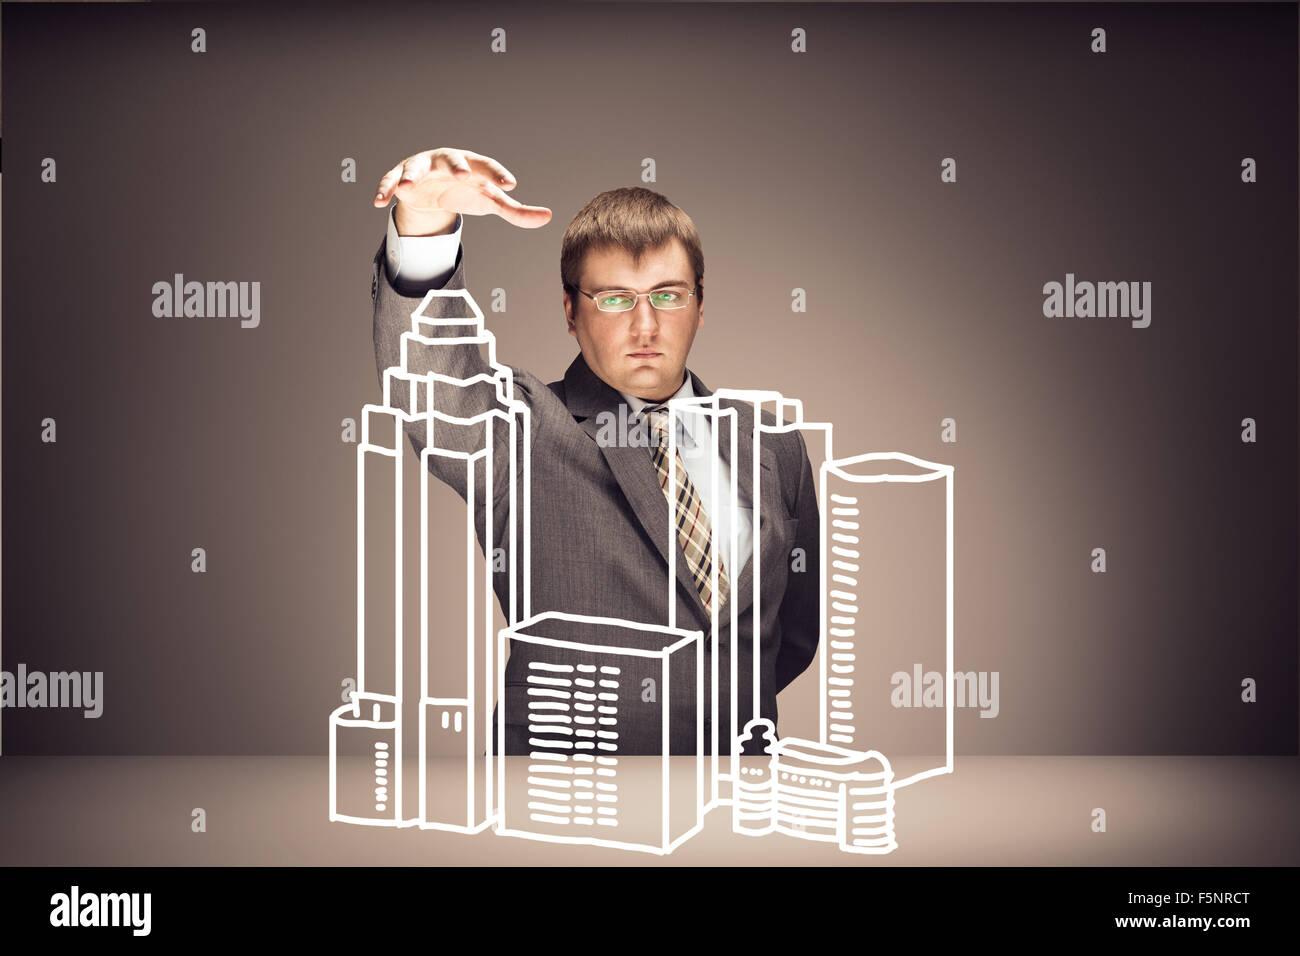 Joven empresario con edificios sobre marrón Imagen De Stock